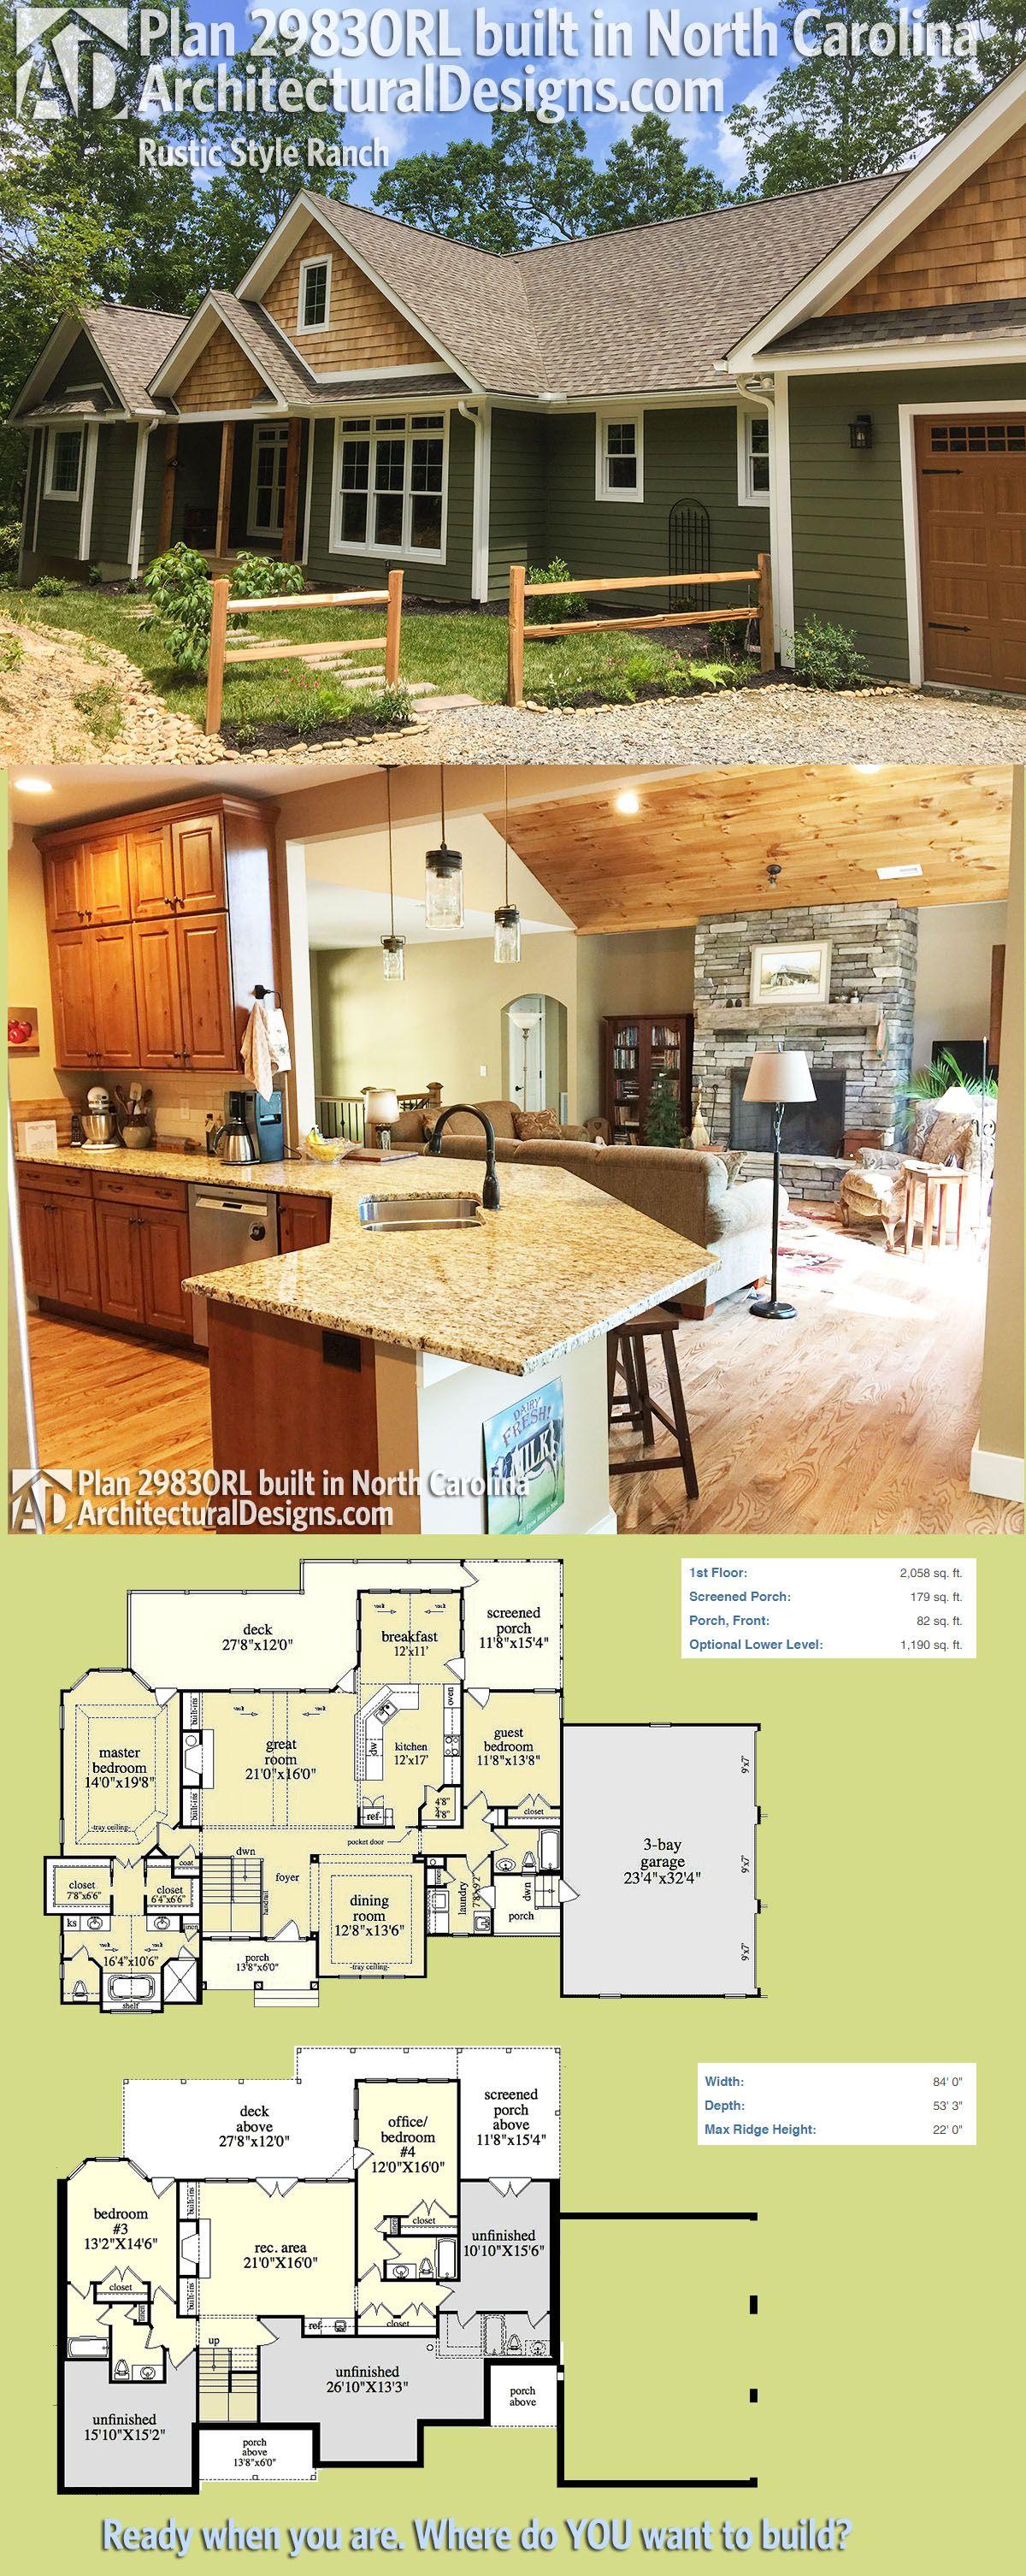 plan 29830rl rustic style ranch ranch house plans north carolina